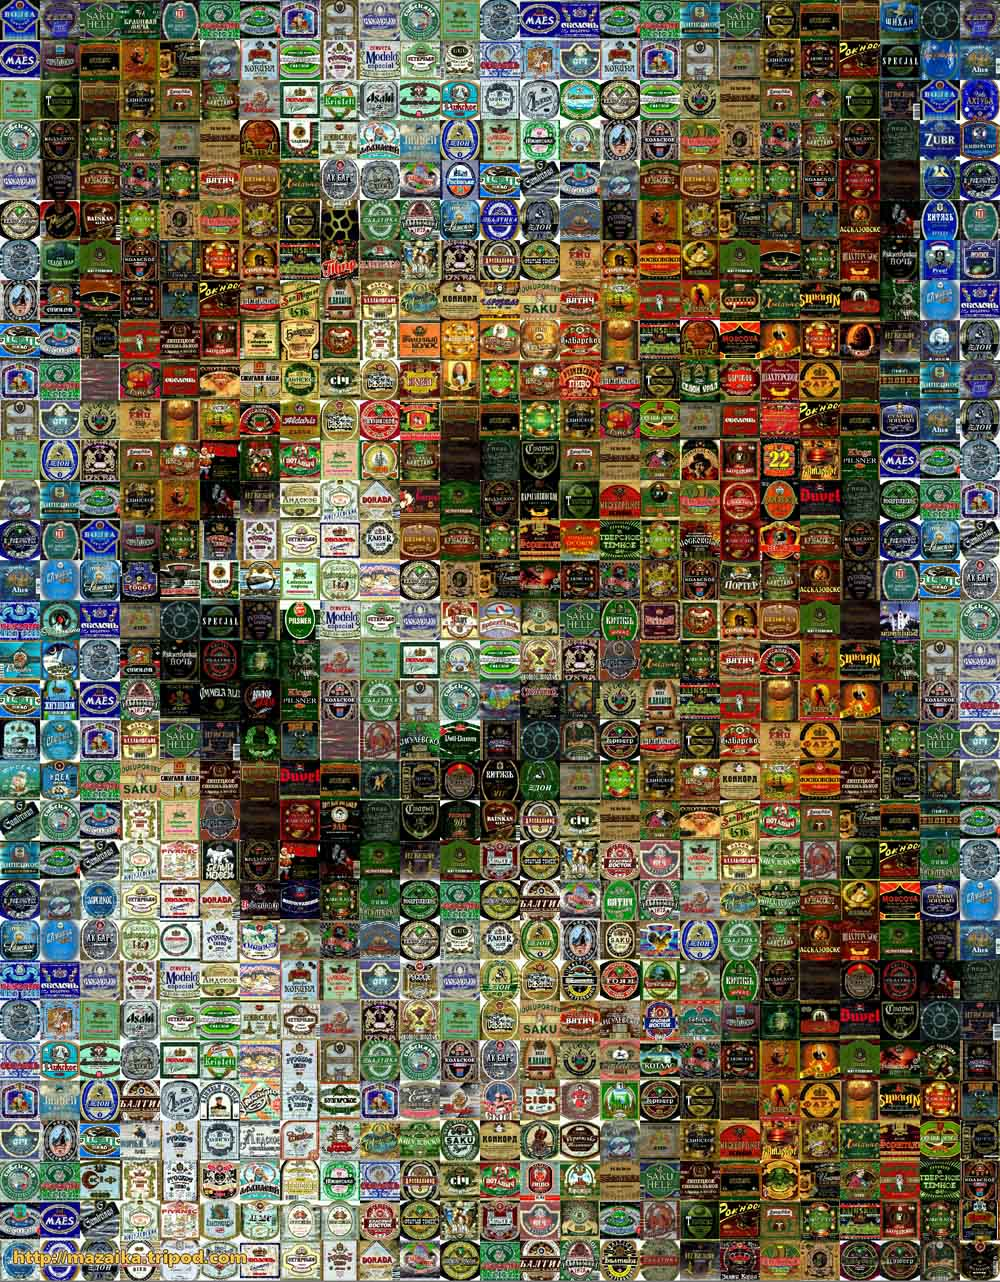 dog_of_beer_big.jpg